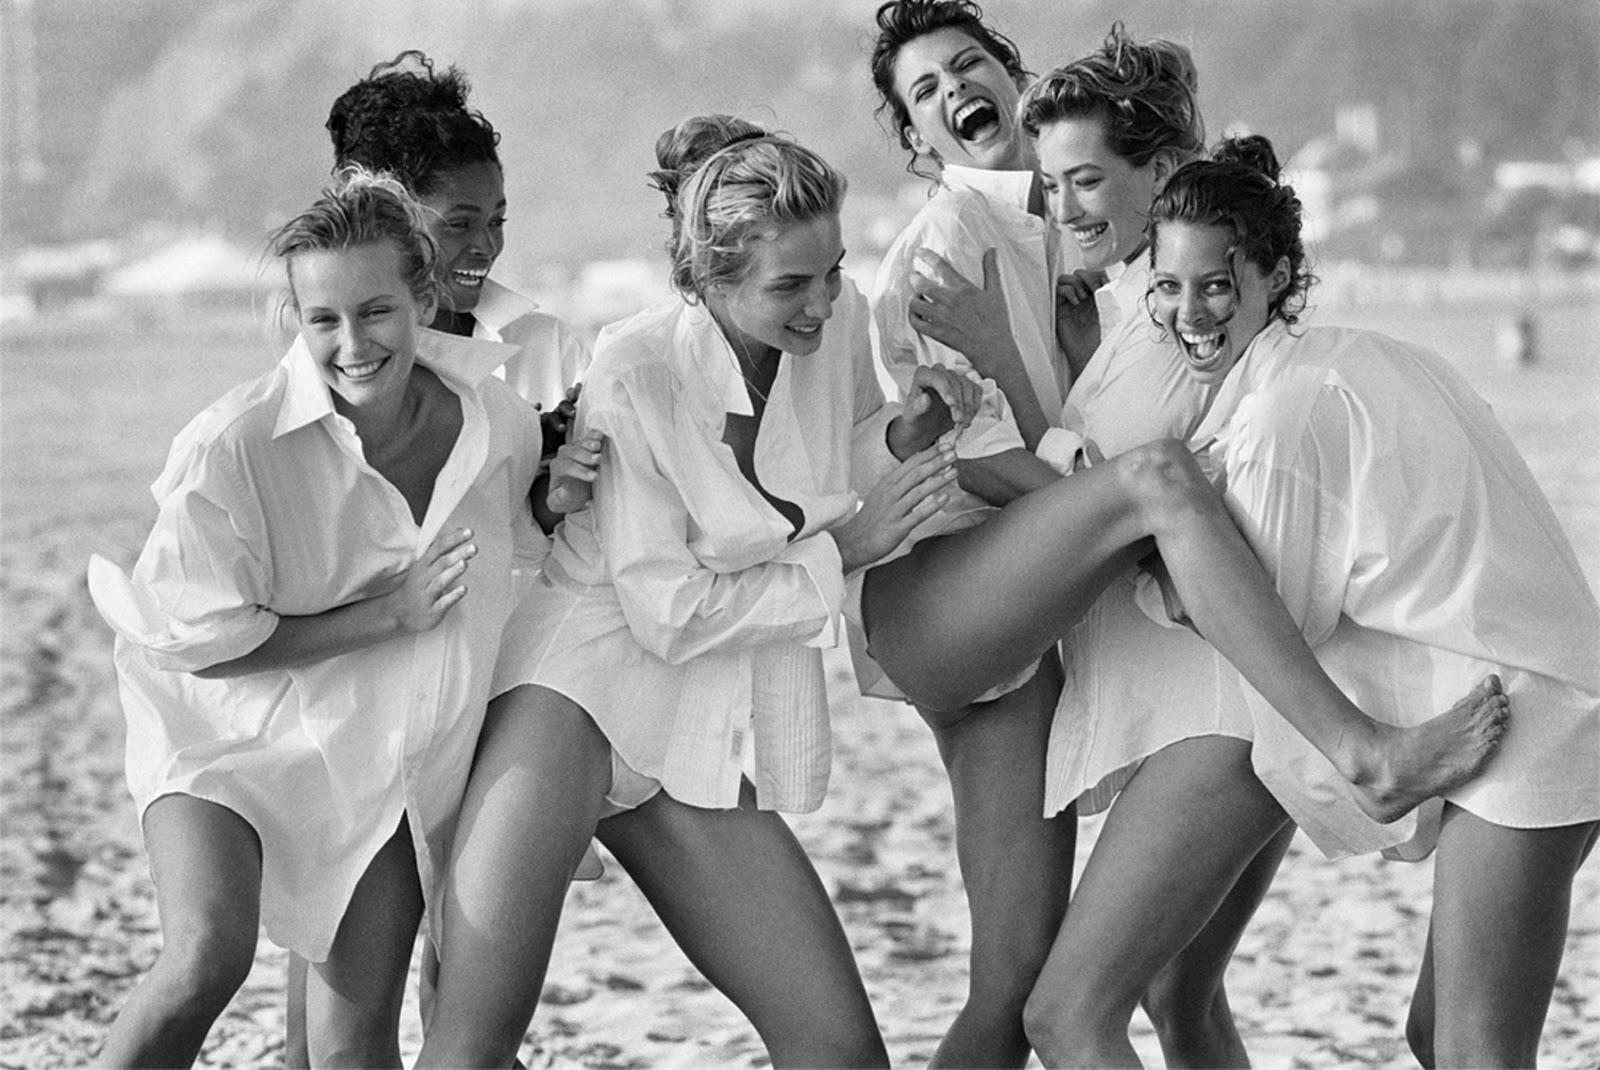 Christy Turlington, Tatjana Patitz, Linda Evangelista photographed by Peter Lindbergh for Vogue US April 1992 / white shirt in fashion editorials / short history of white shirt / wardrobe essentials / via fashioned by love british fashion blog